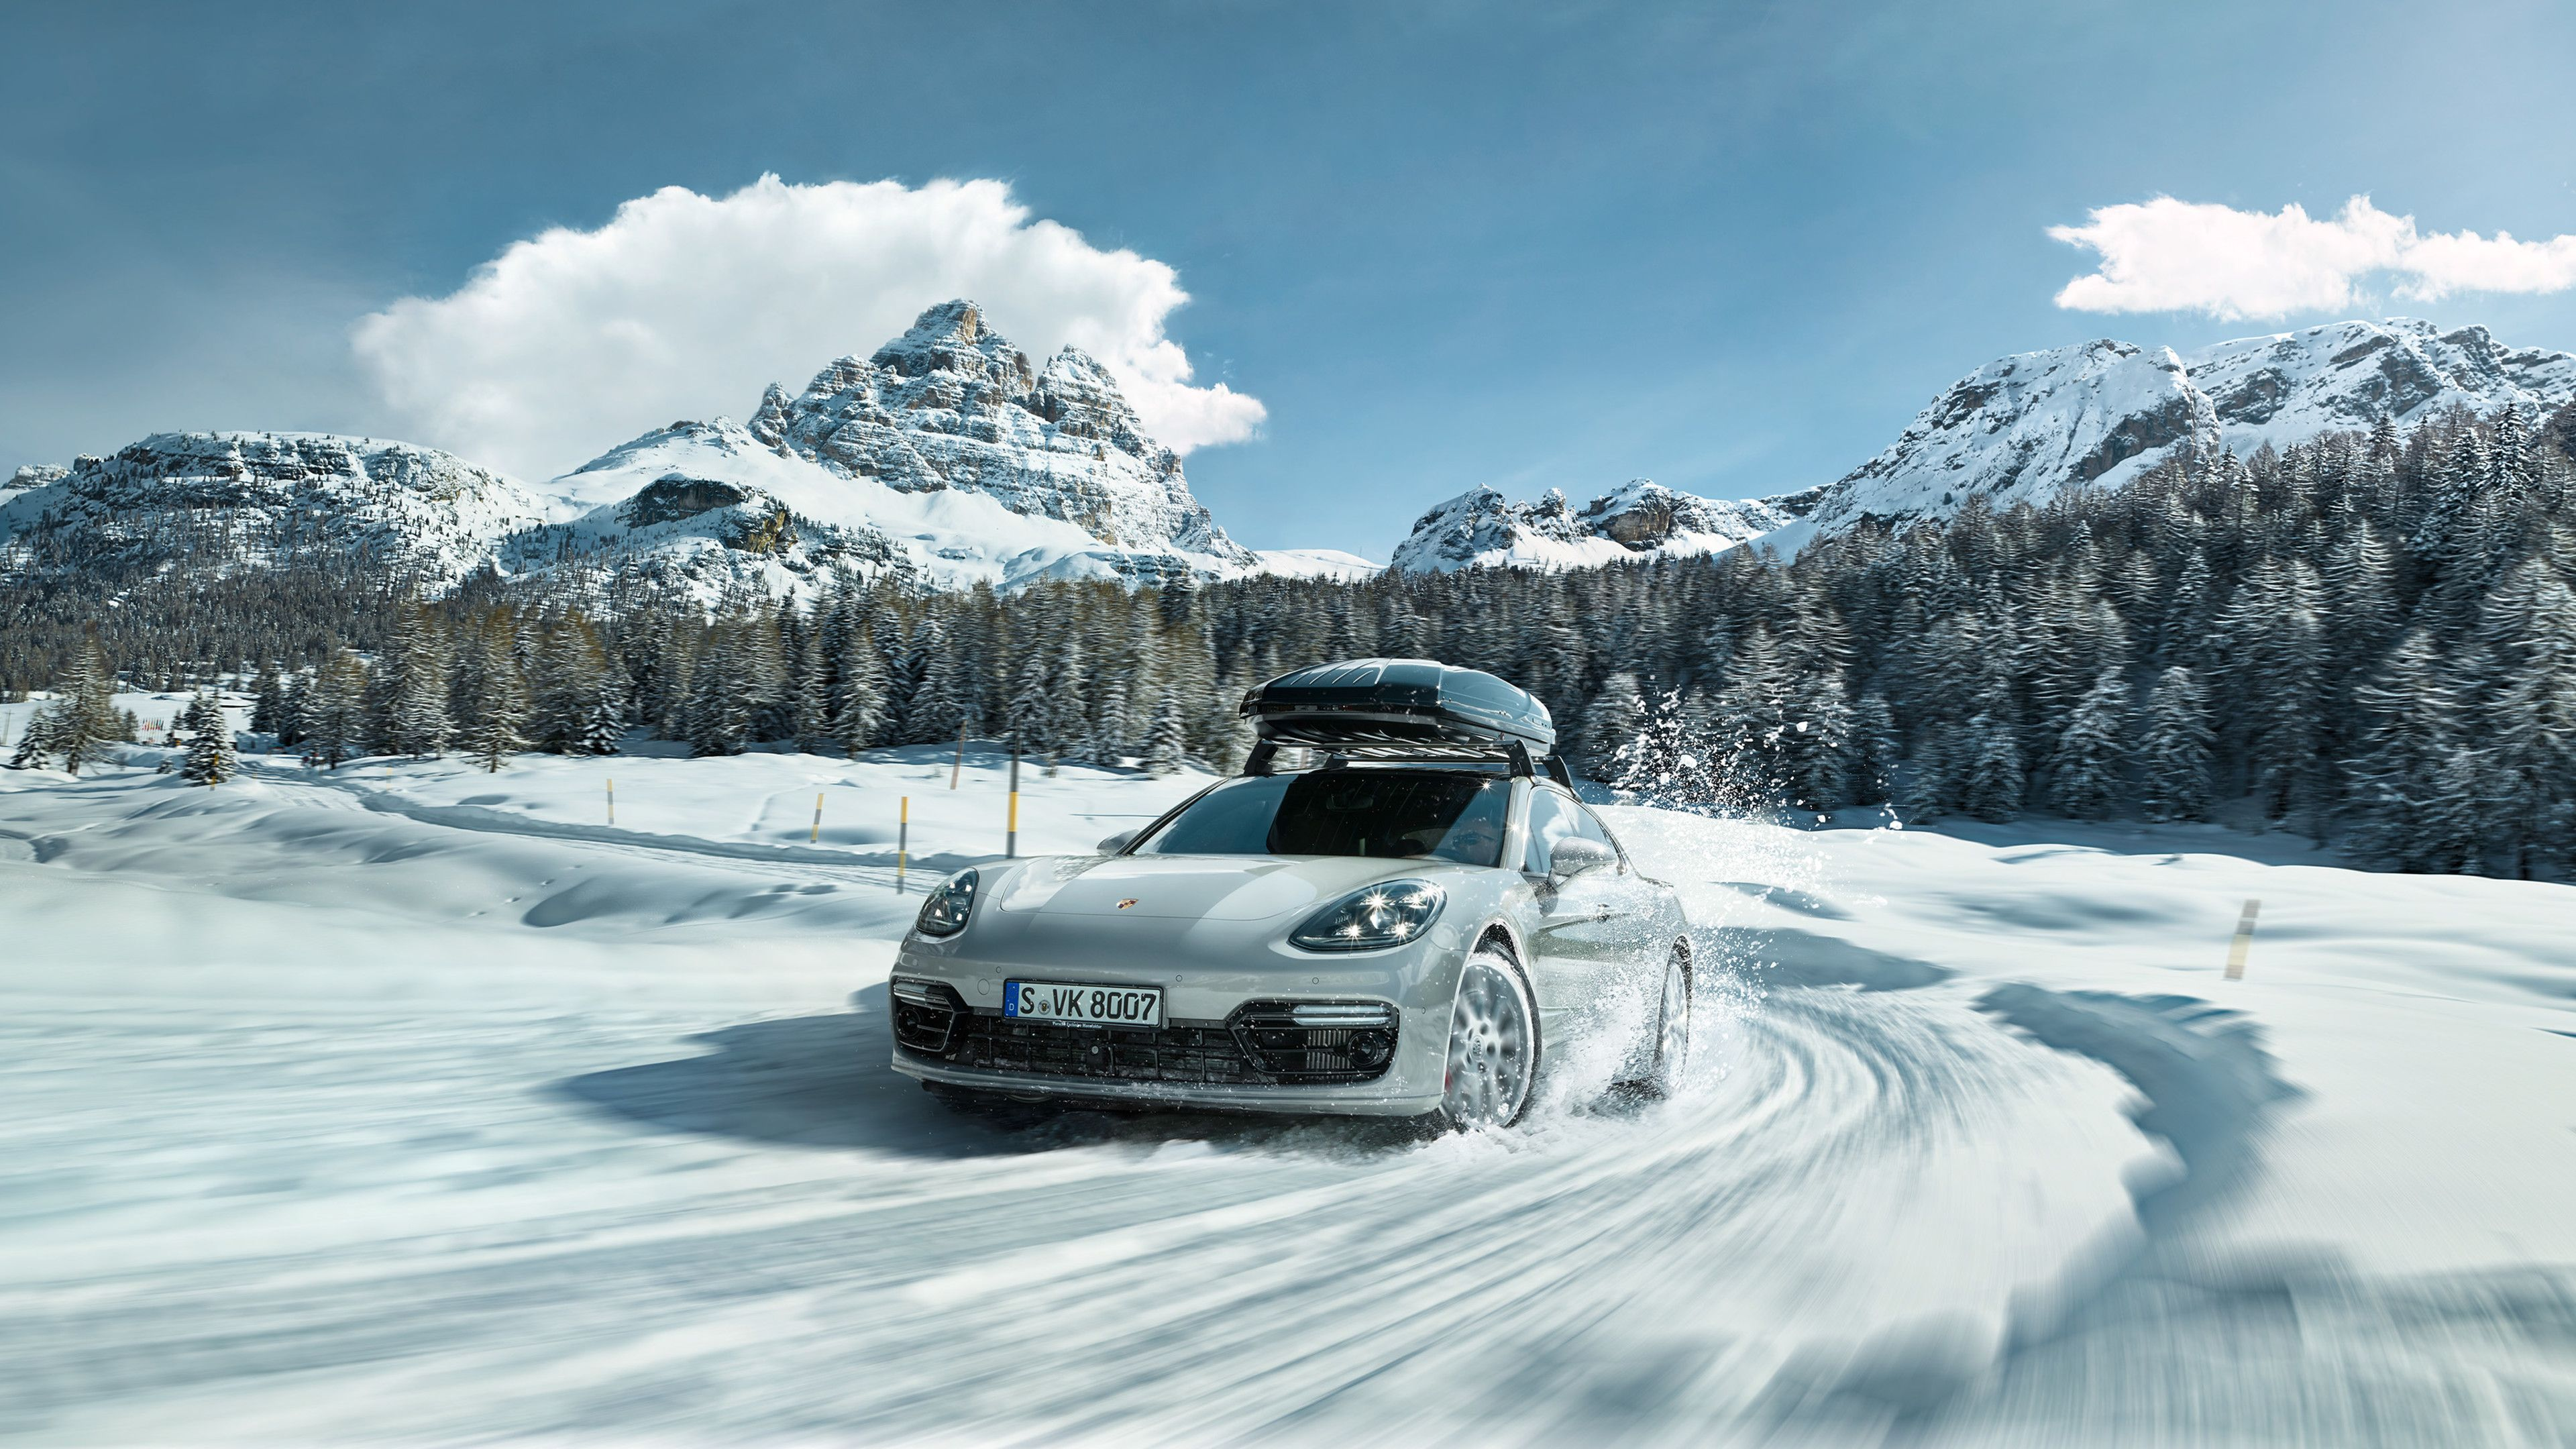 Porsche In Snow 4k snow wallpapers, porsche wallpapers, hd